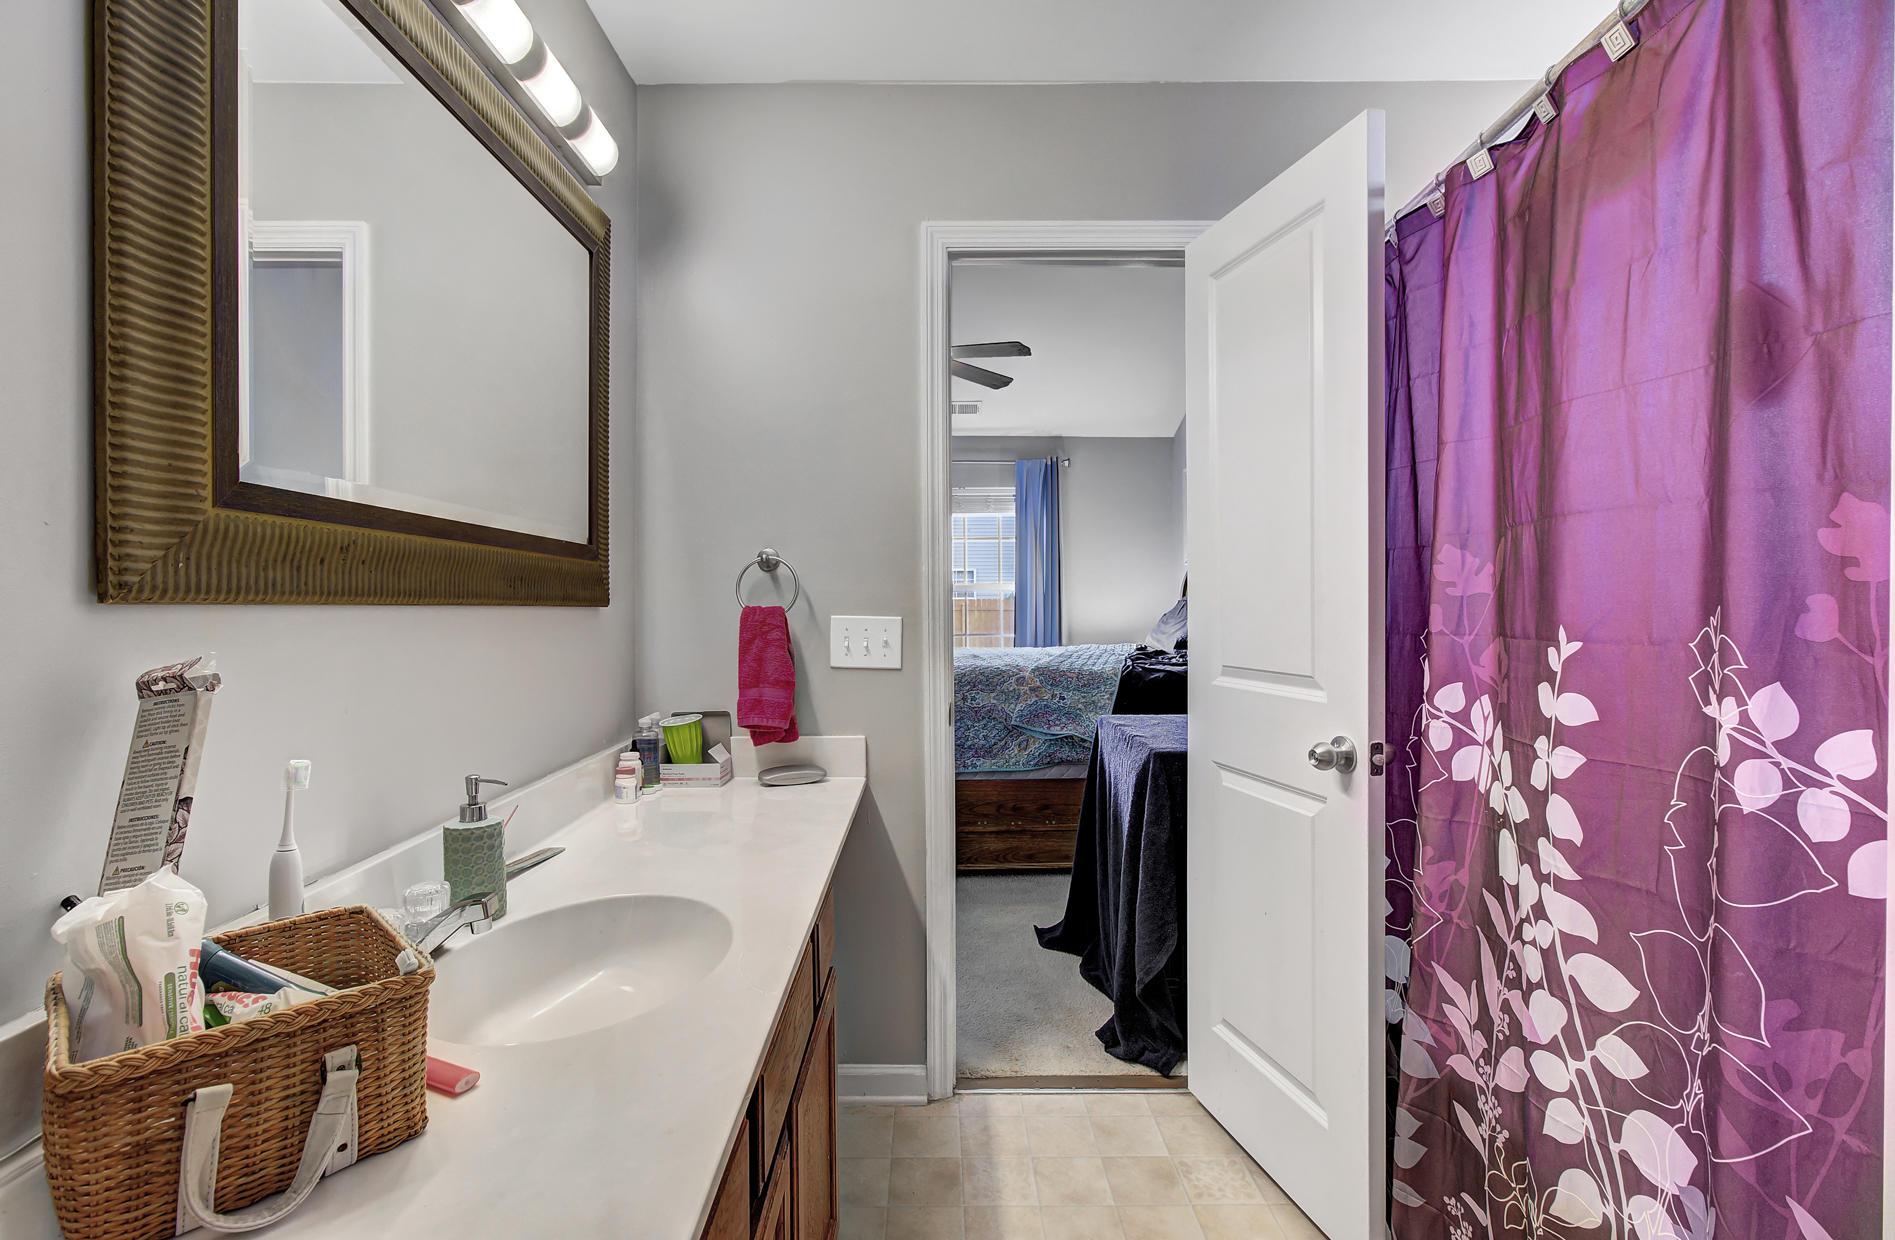 Oakley Pointe Homes For Sale - 231 Silk Oak, Moncks Corner, SC - 18